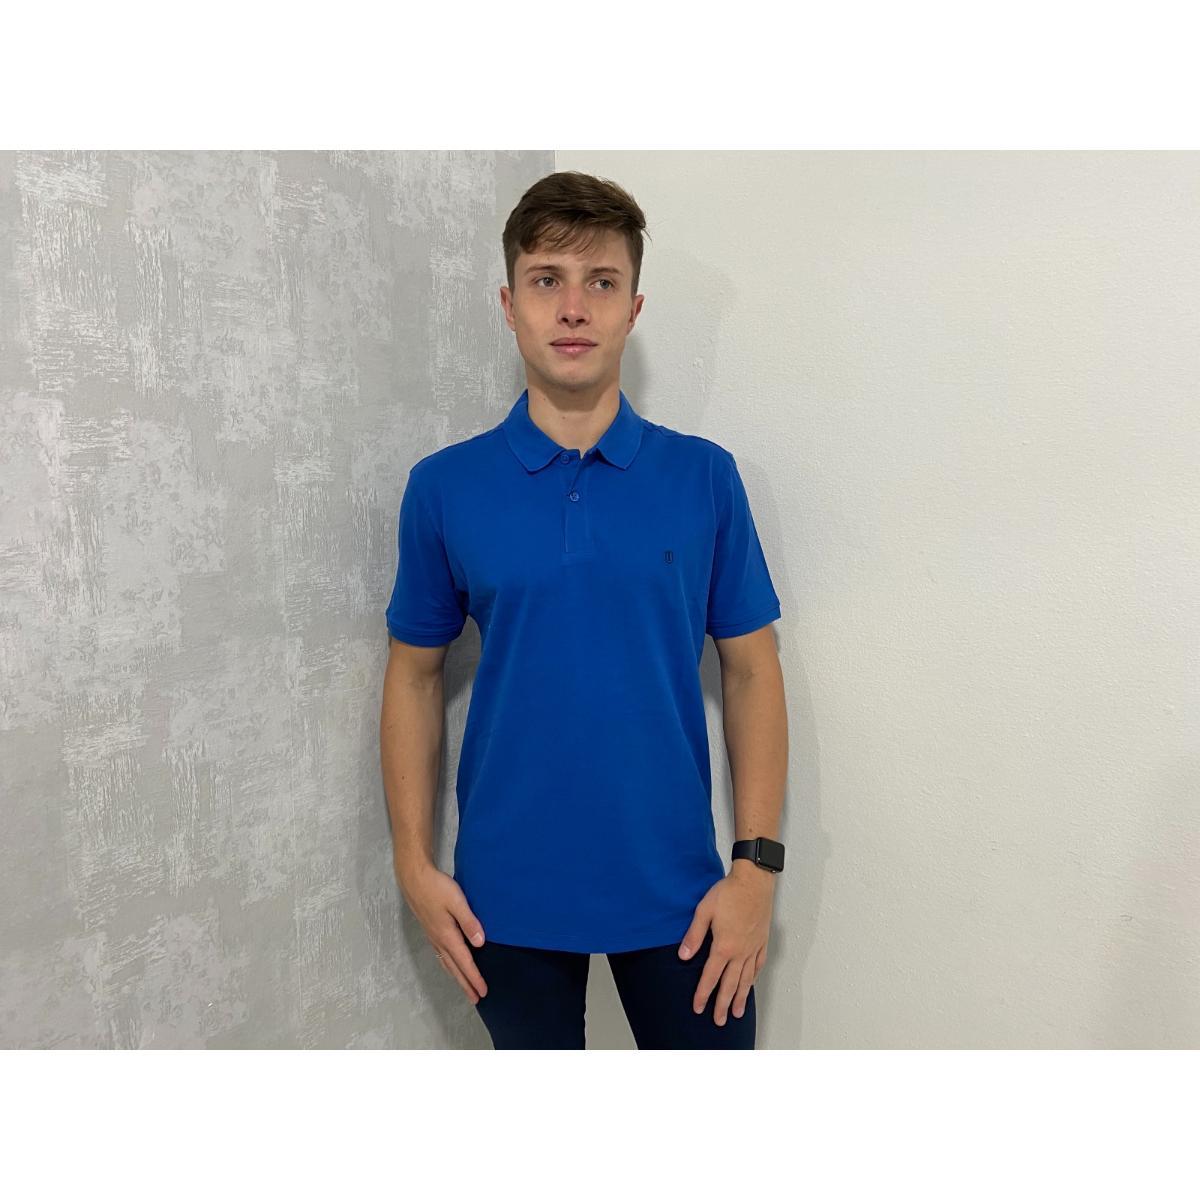 Camiseta Masculina Individual 08.75.0704 Azul Médio